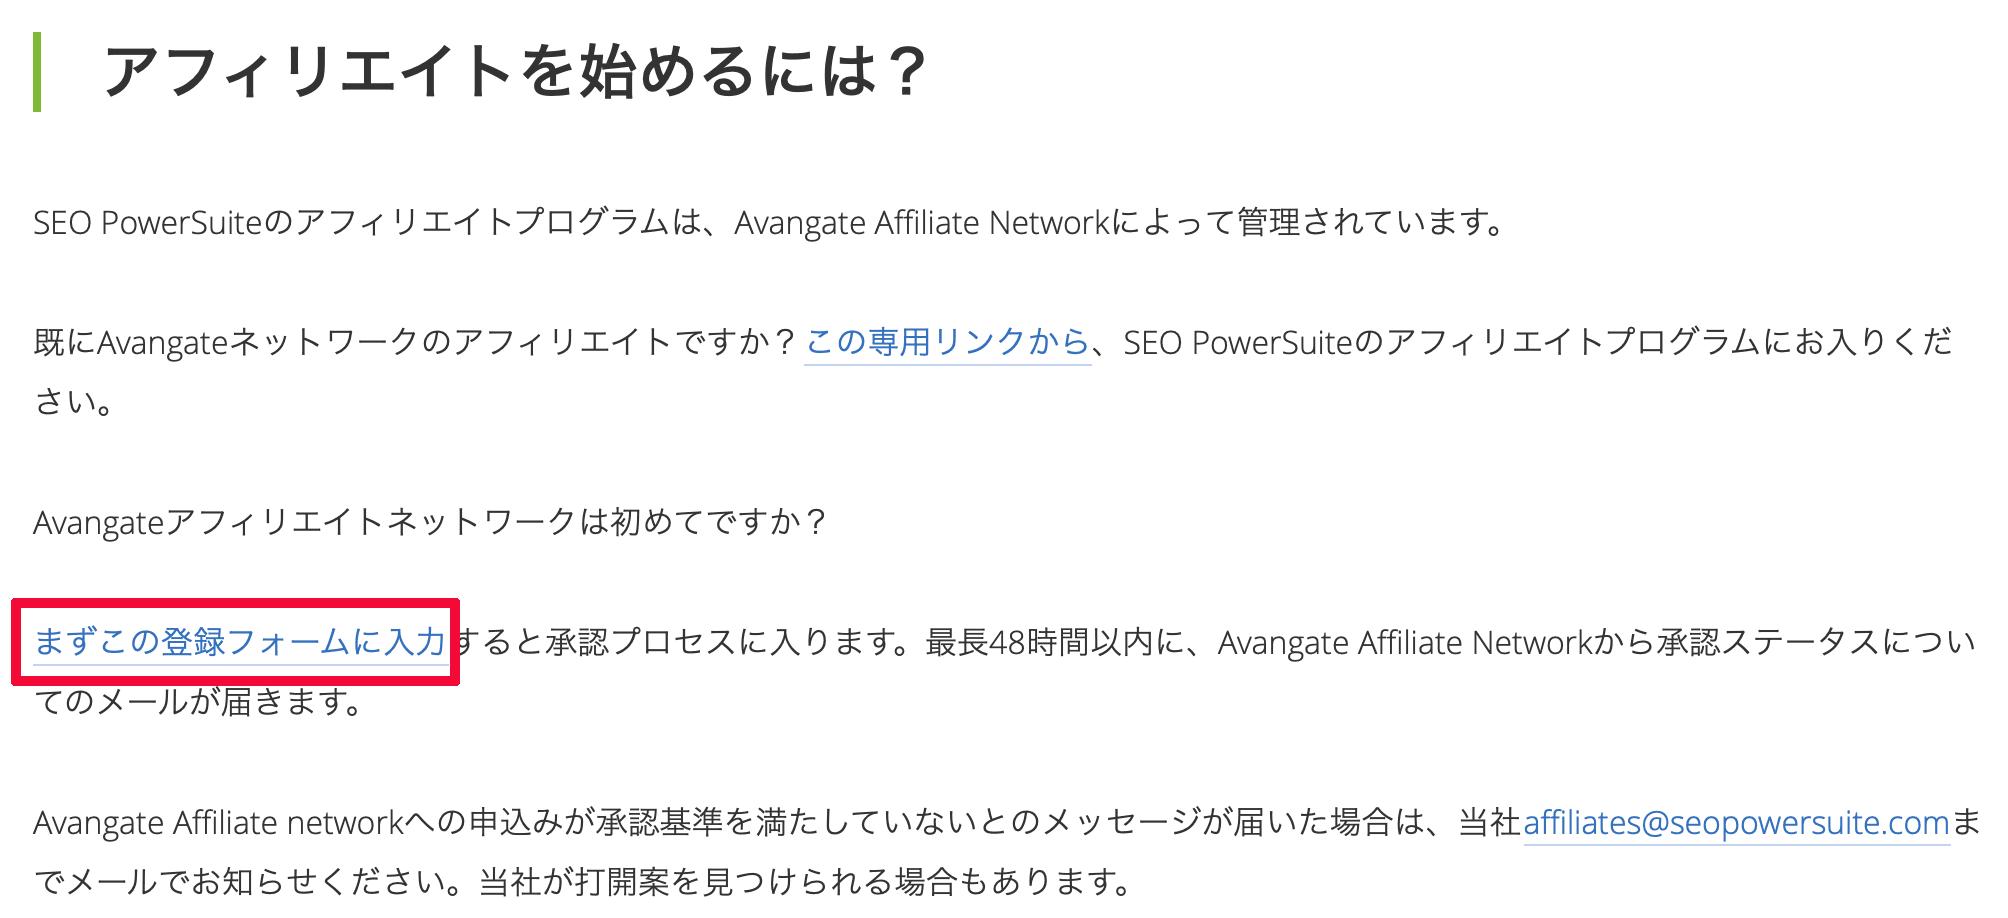 Avangateアカウント登録2